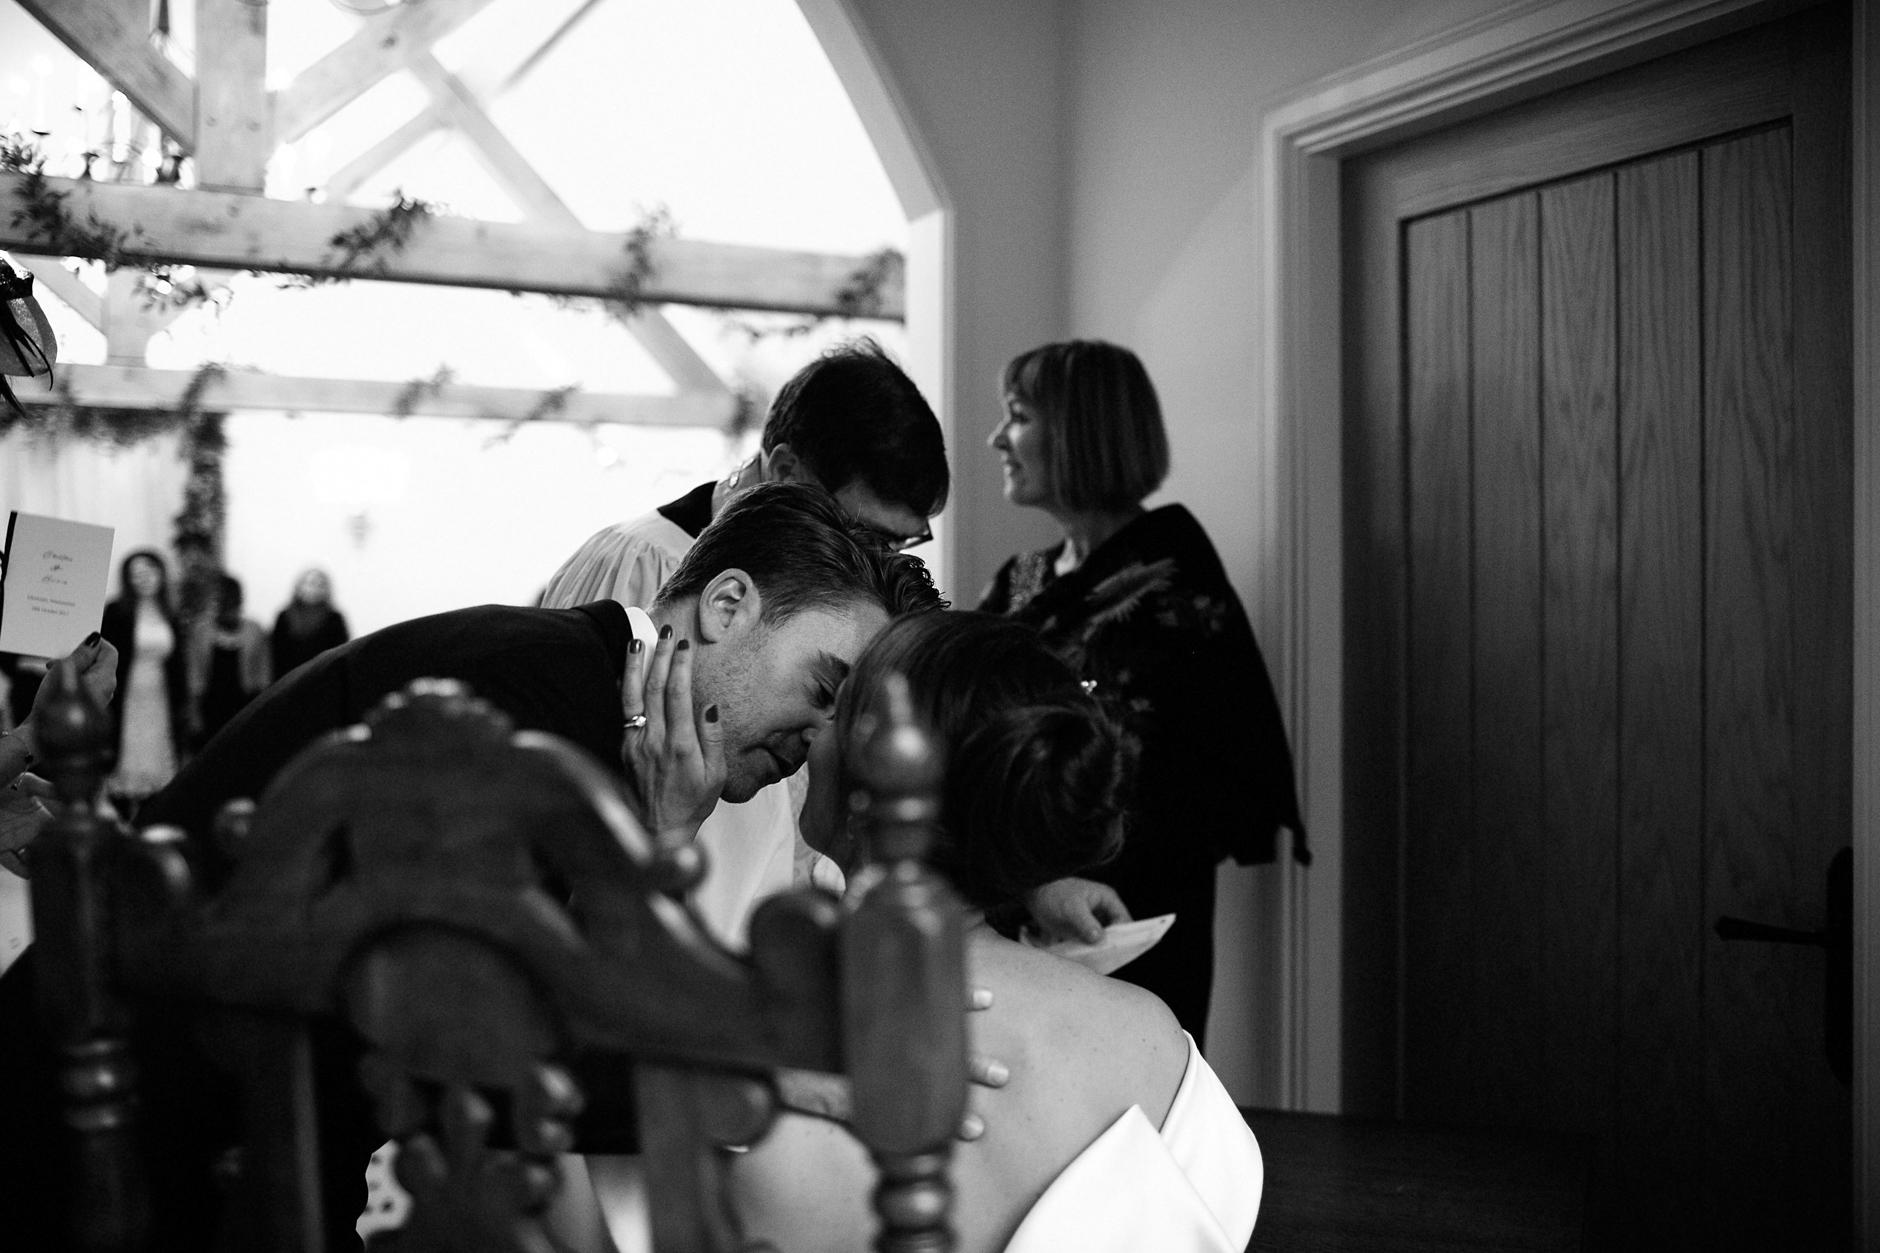 Glentruim-Wedding-Nikki-Leadbetter-Photography-108.jpg